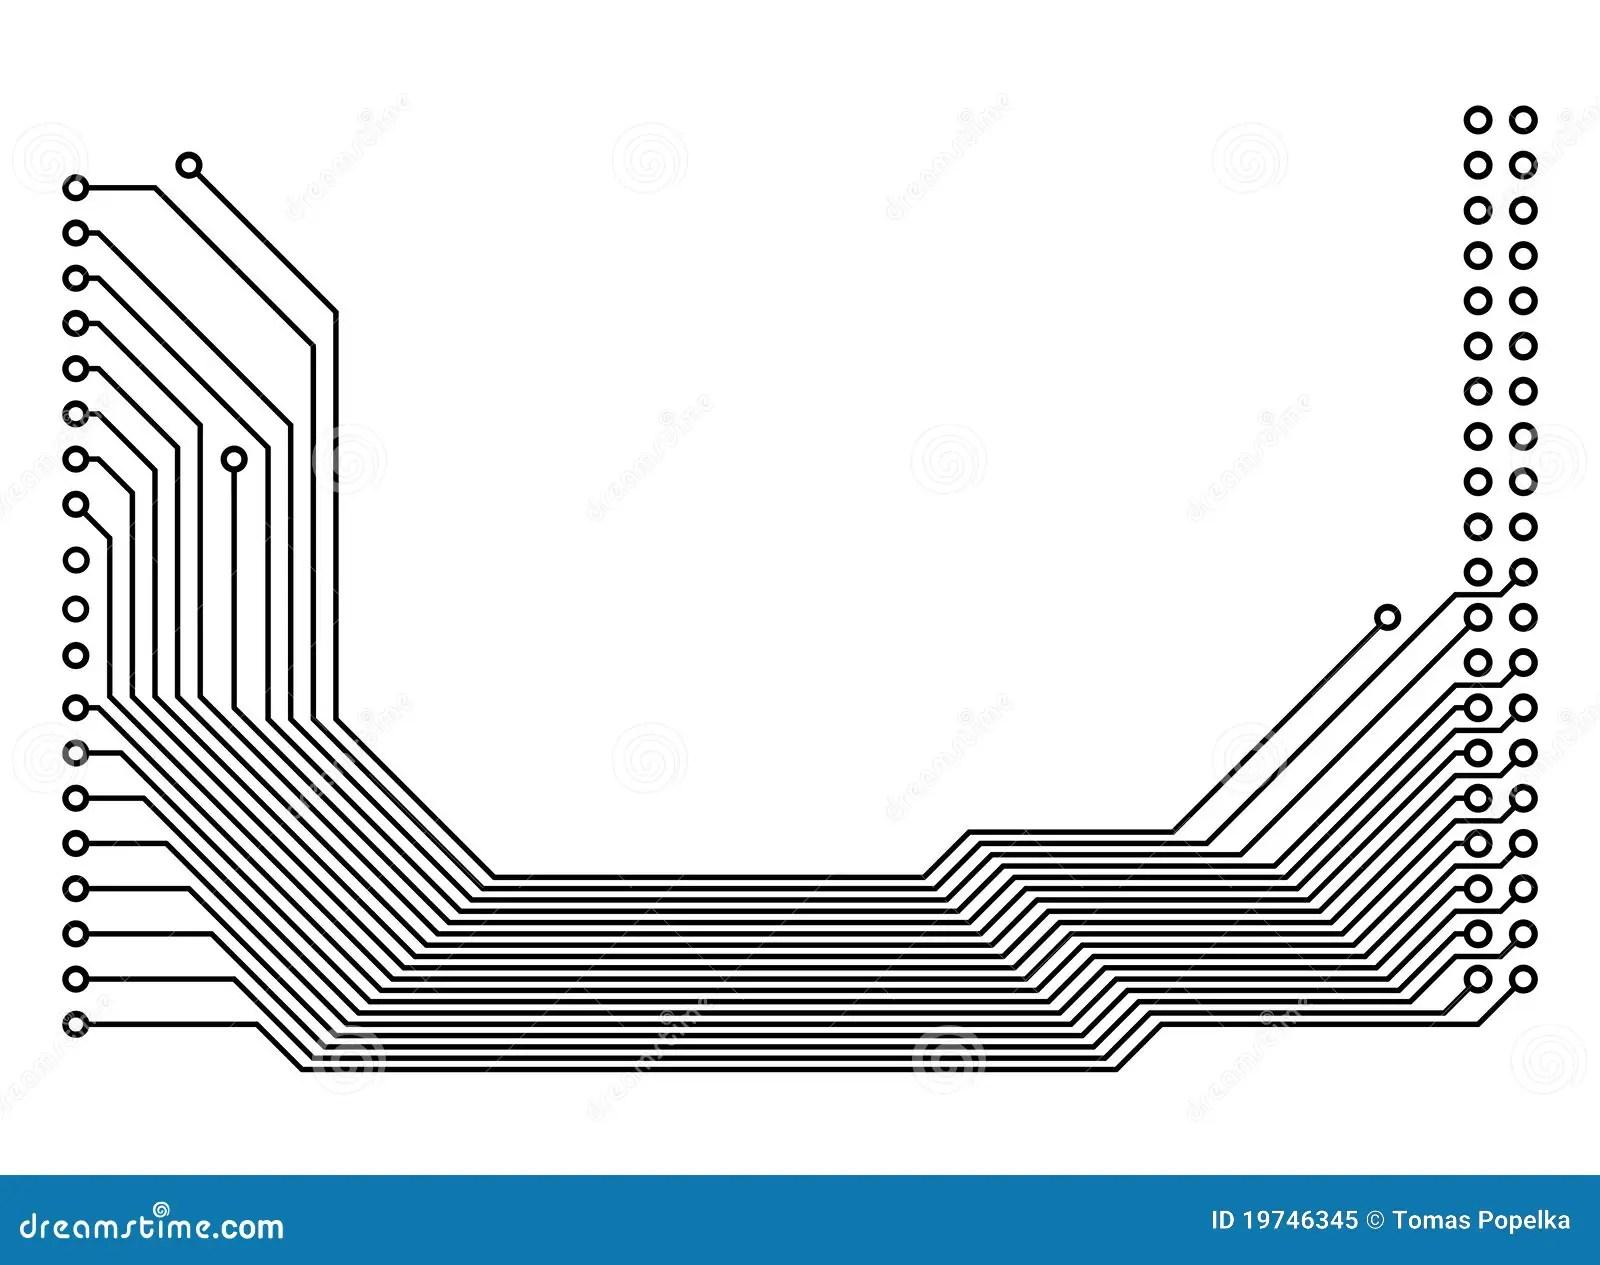 PCB (printed Circuit Board) Stock Illustration